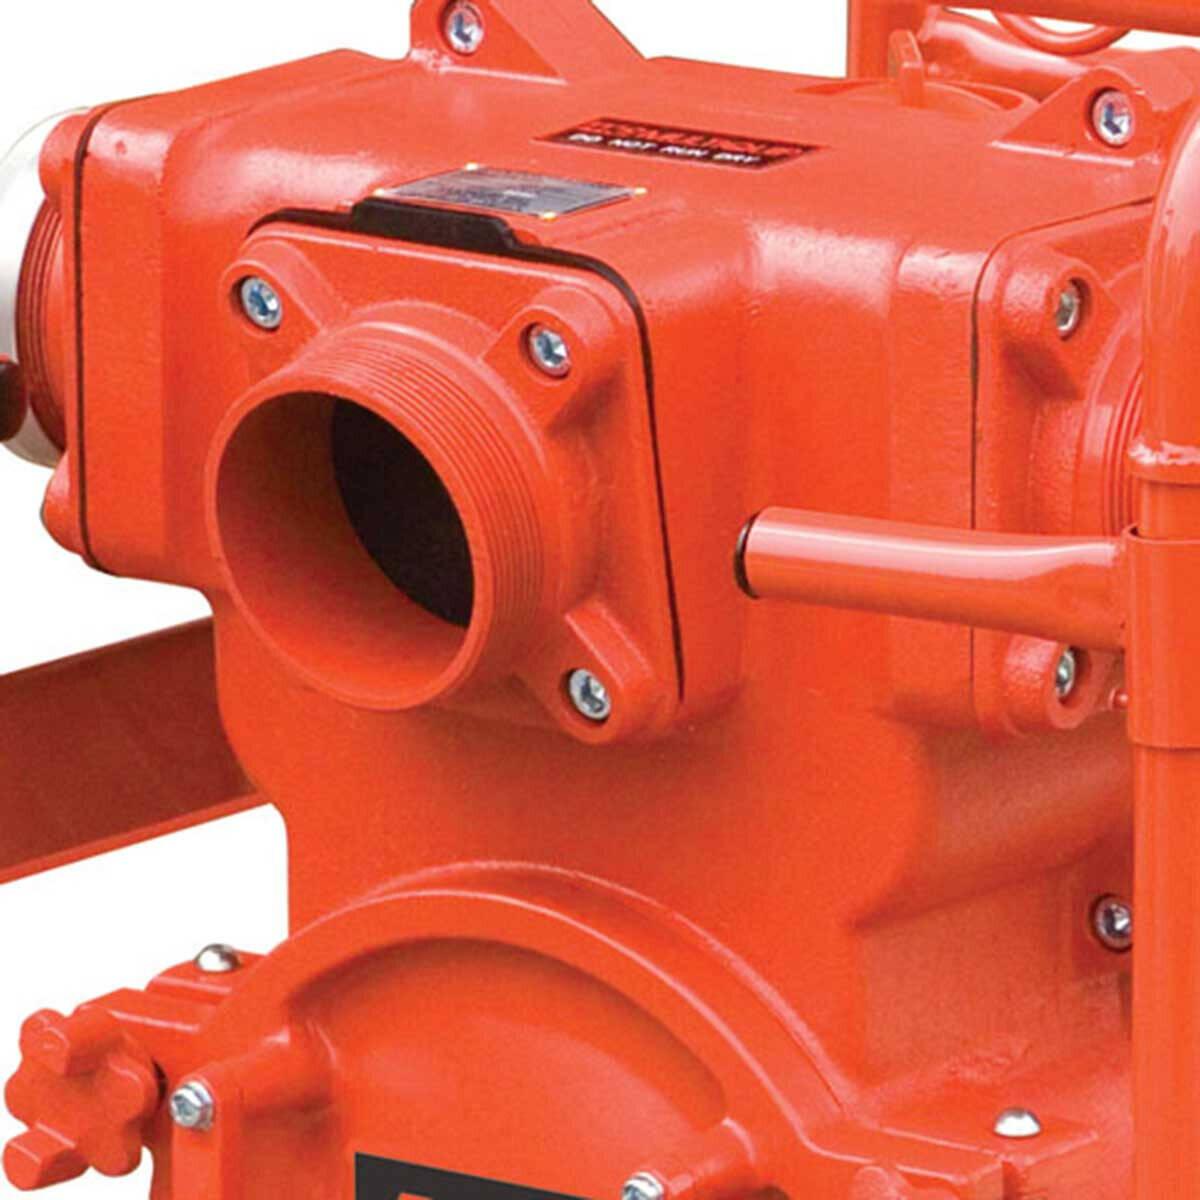 Multiquip QP4TH Pump Discharge Port